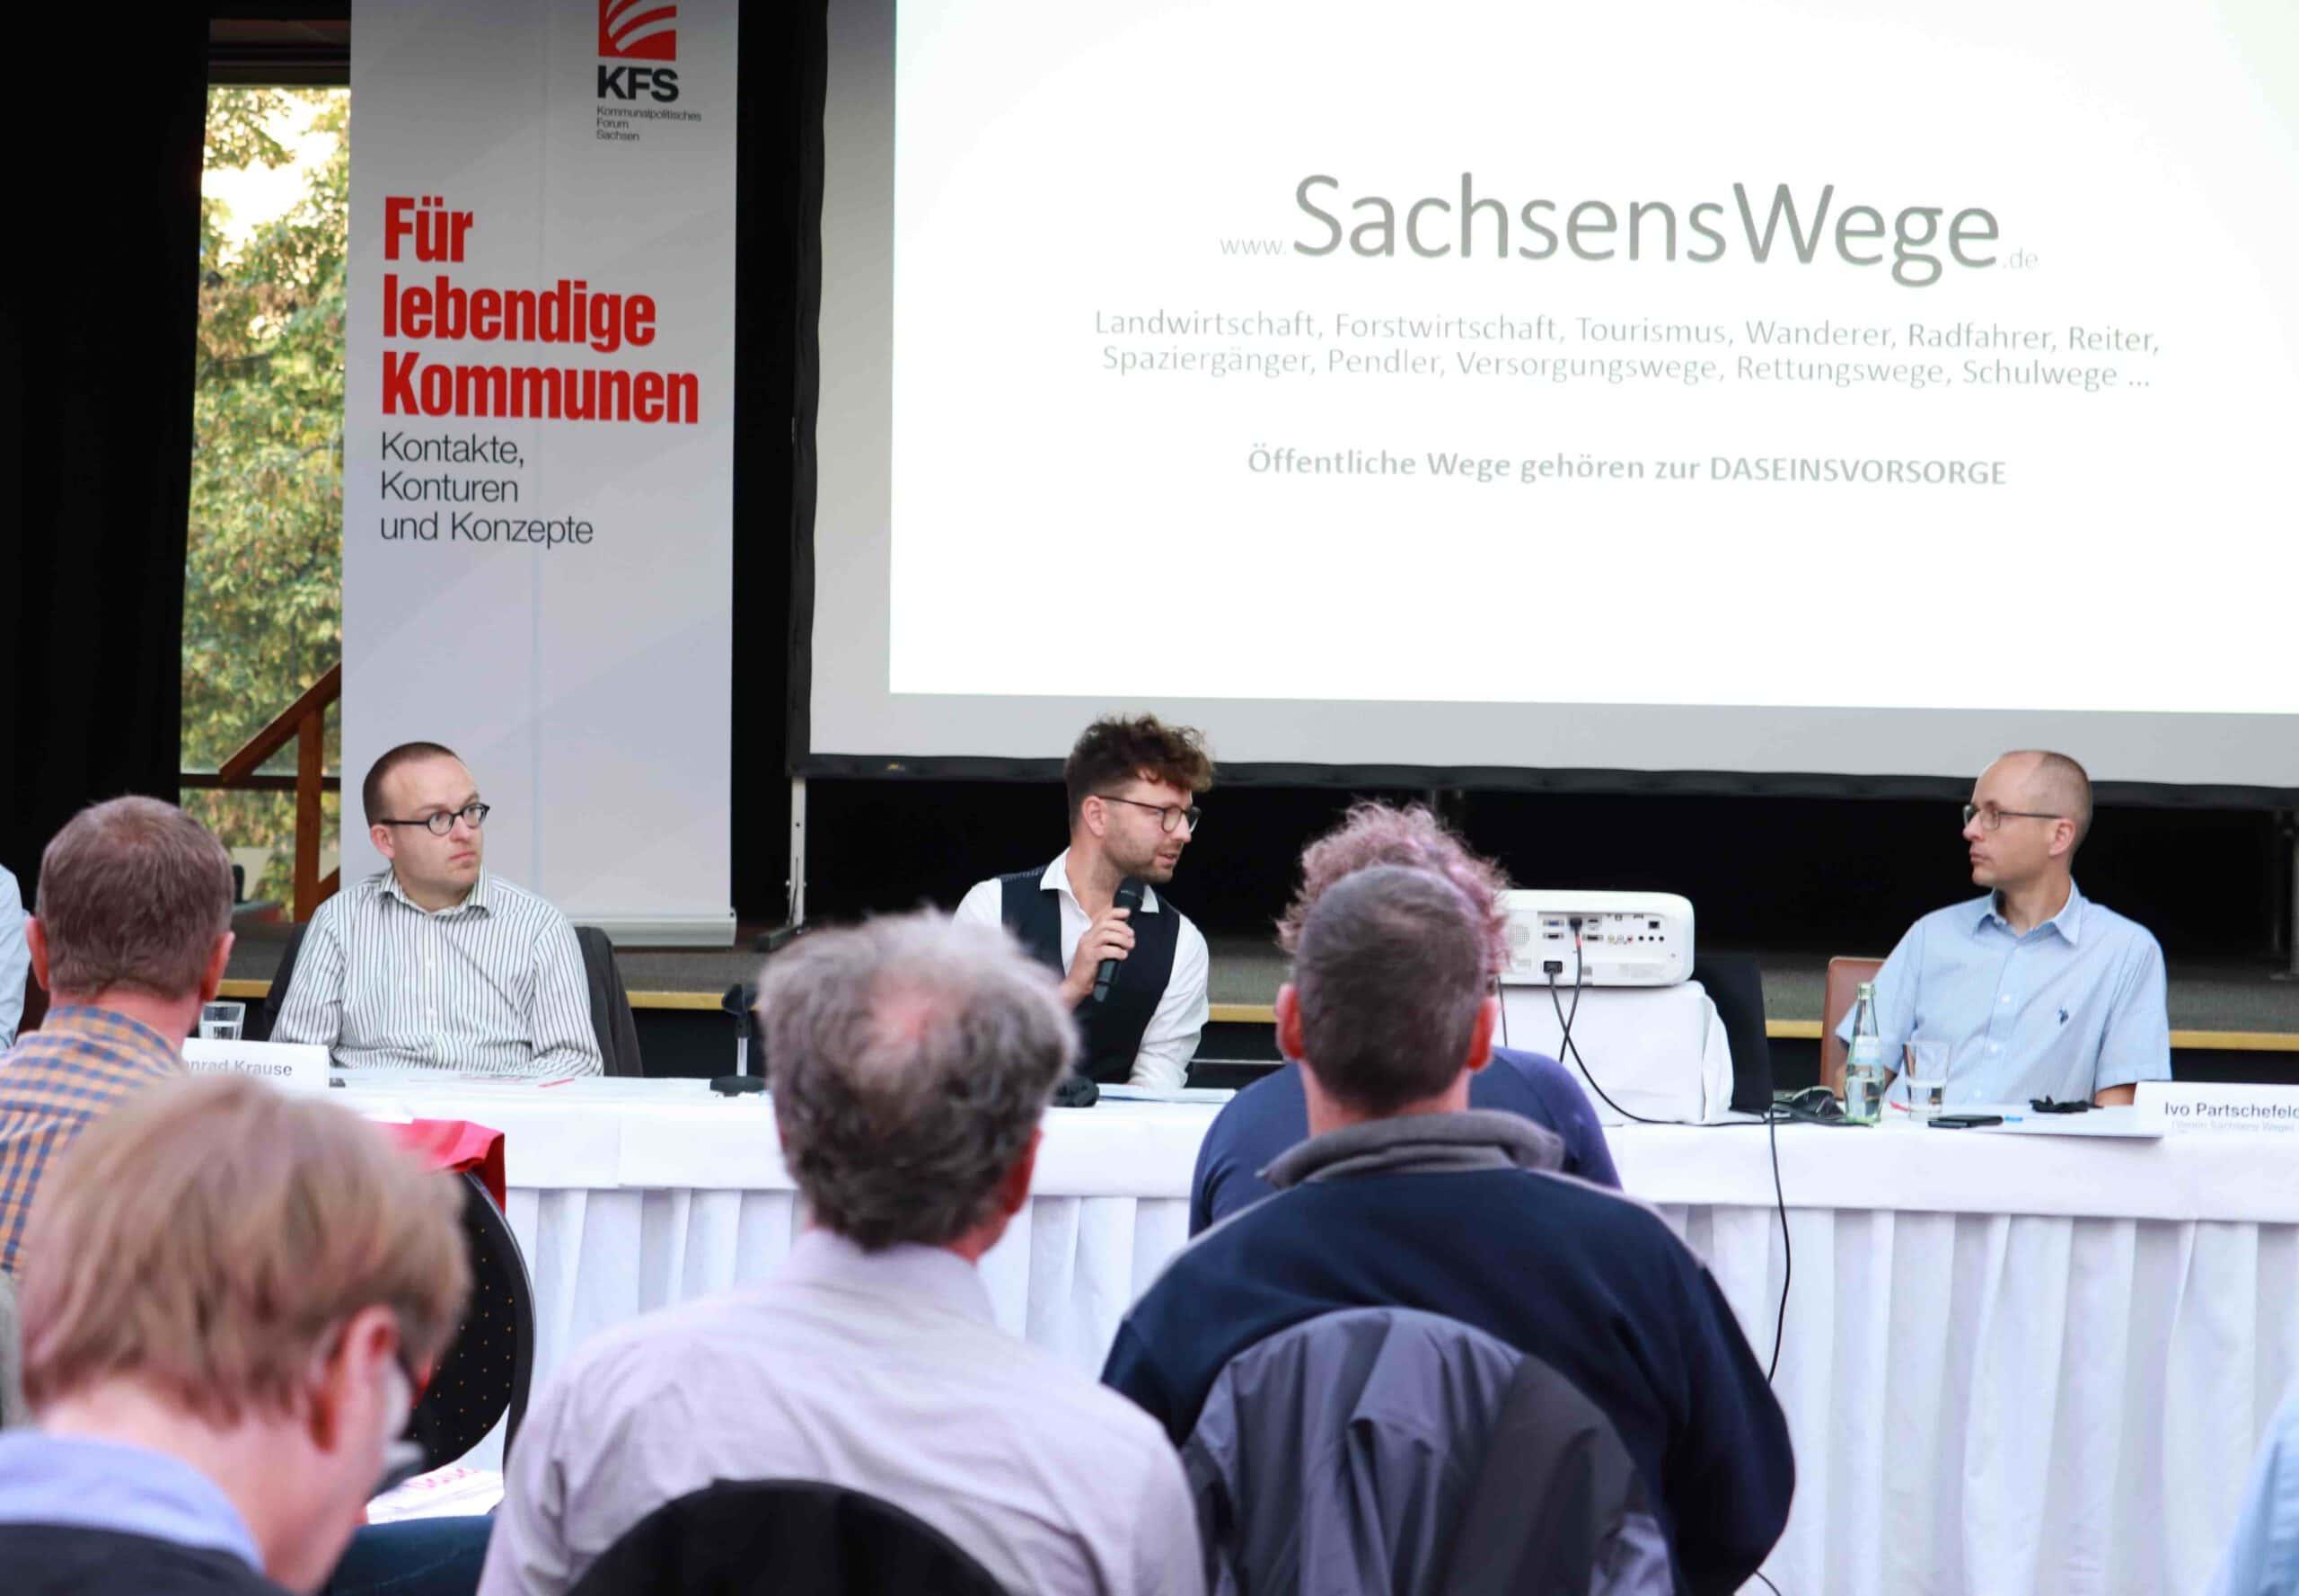 v.l.n.r.: Konrad Krause (ADFC), Lars Kleba (KFS), Ivo Partschefeld (Sachsens Wege)